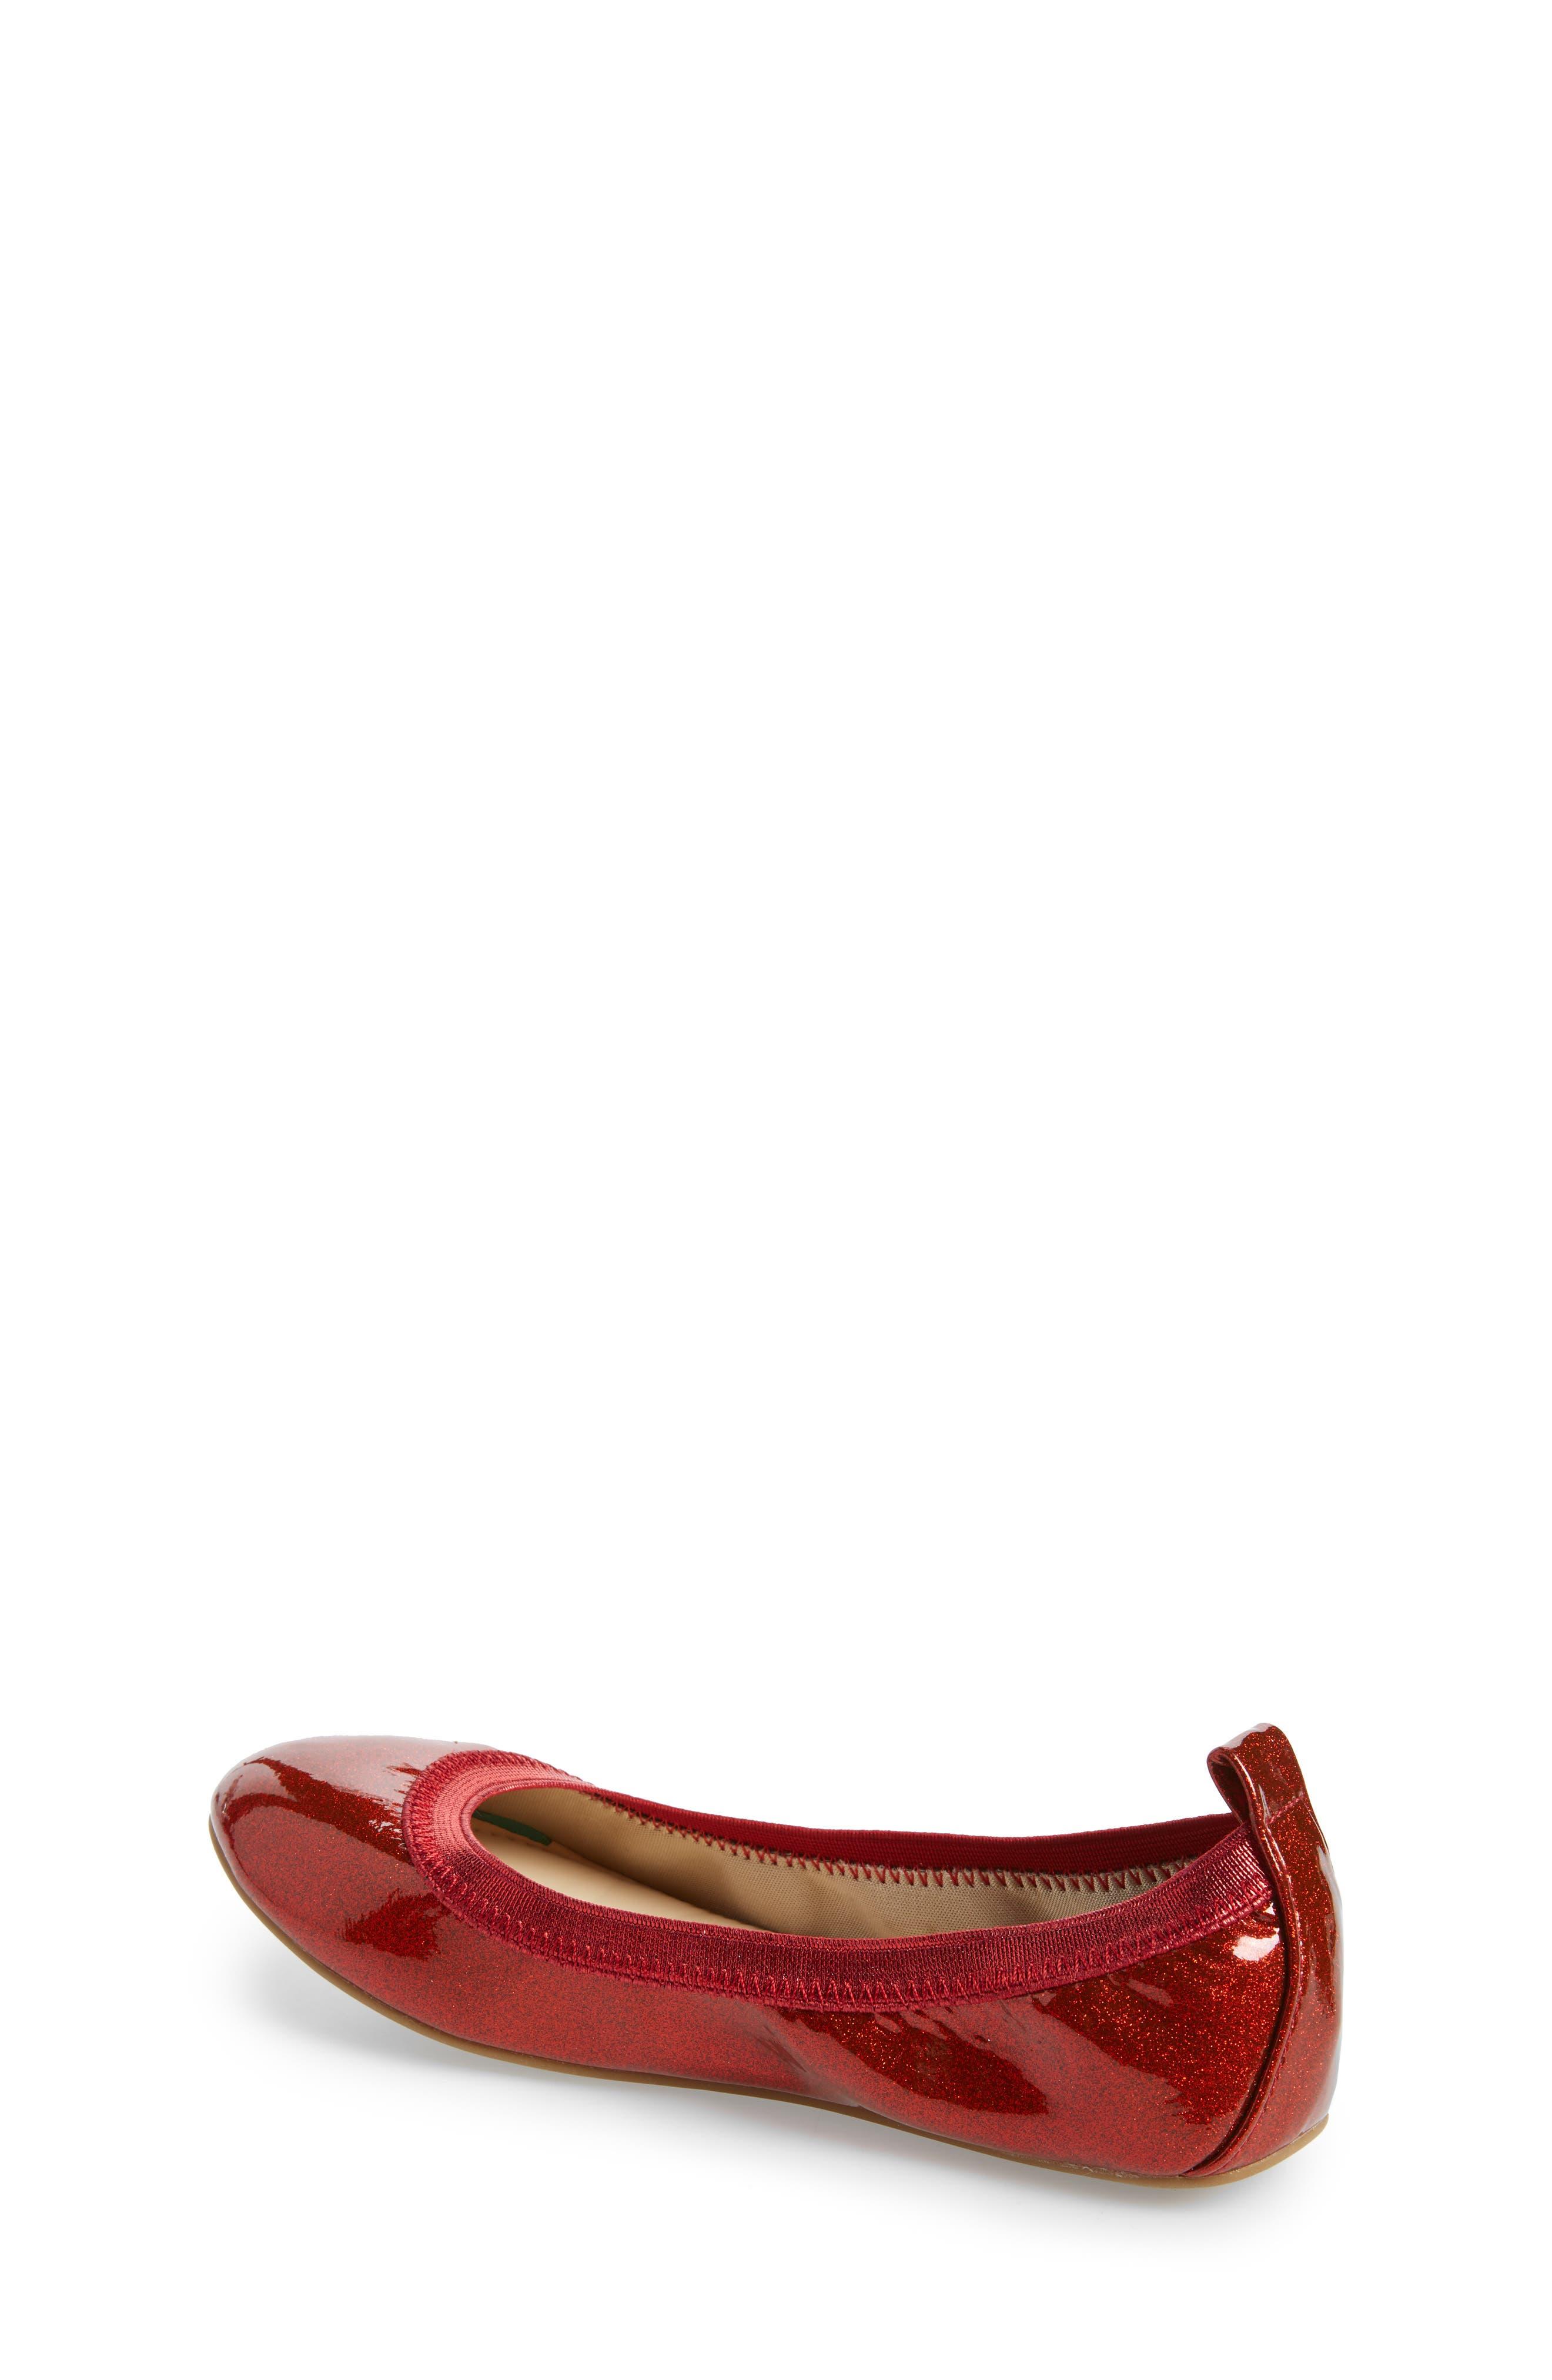 Miss Samara Ballet Flat,                             Alternate thumbnail 2, color,                             RED PATENT GLITTER